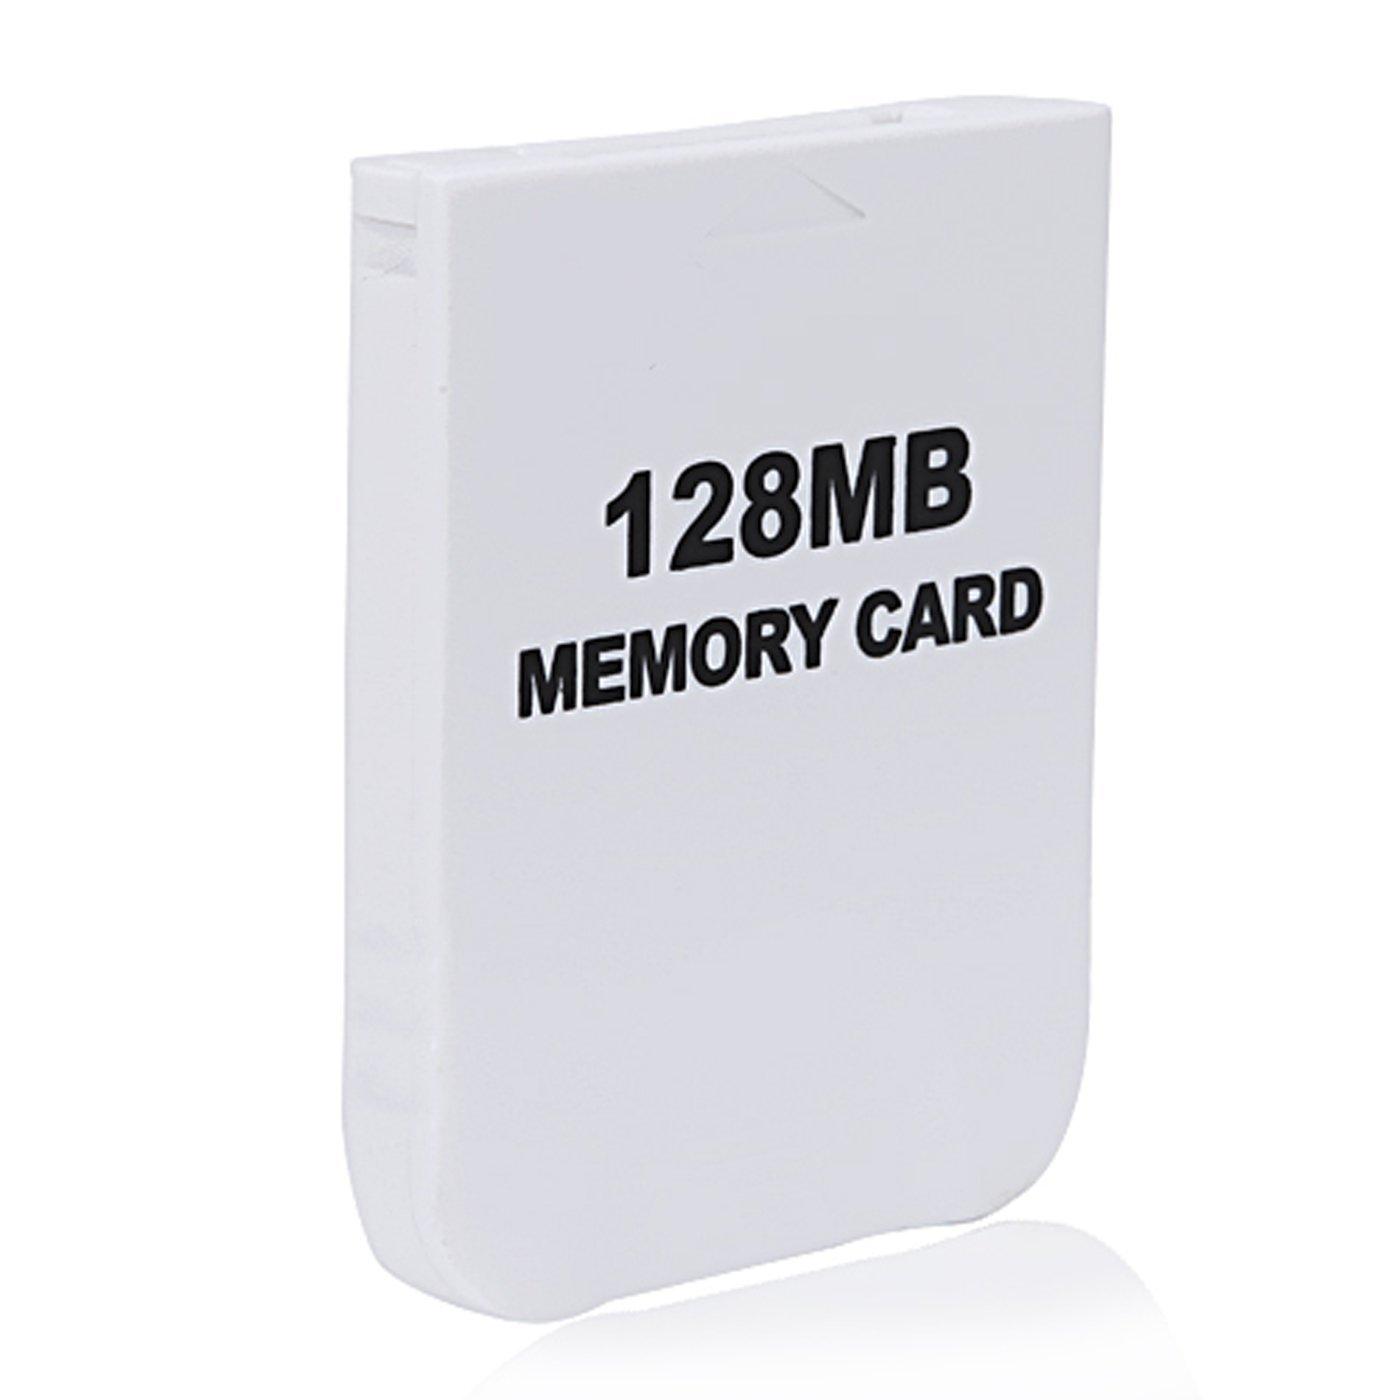 eForBuddy 128MB GC Memory Card for Nintendo Wii GameCube, Black by eForBuddy